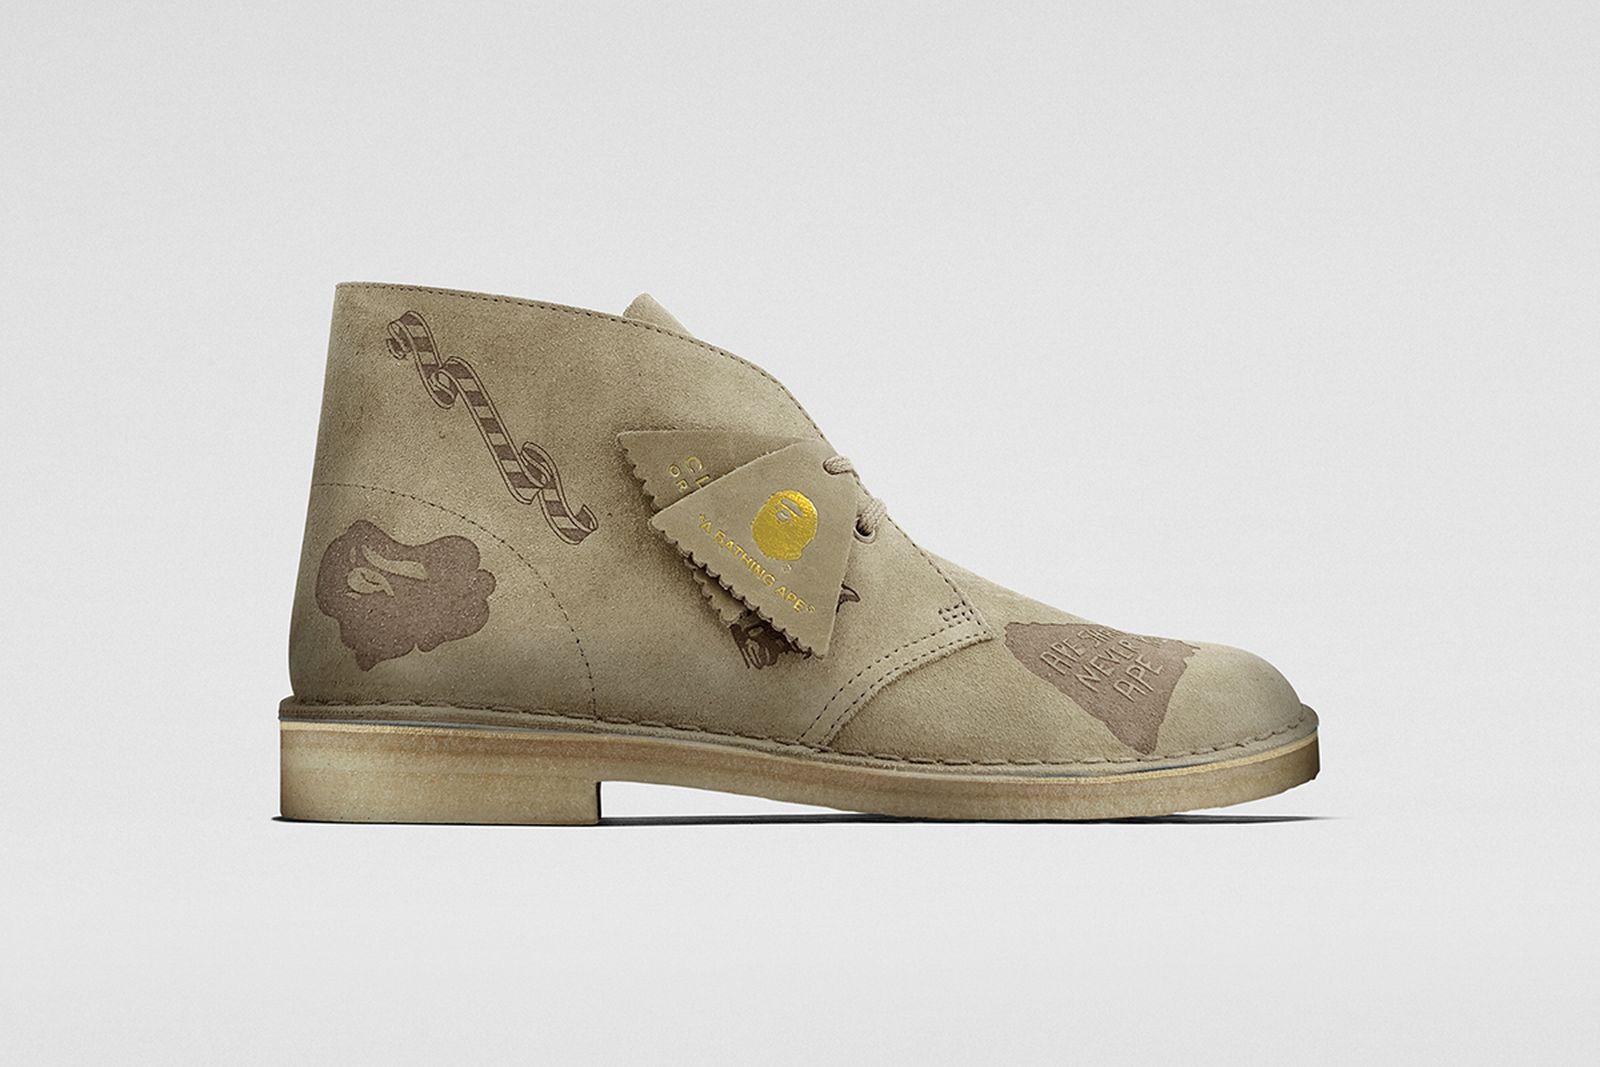 bape-clarks-wallabee-desert-boot-release-date-price-14